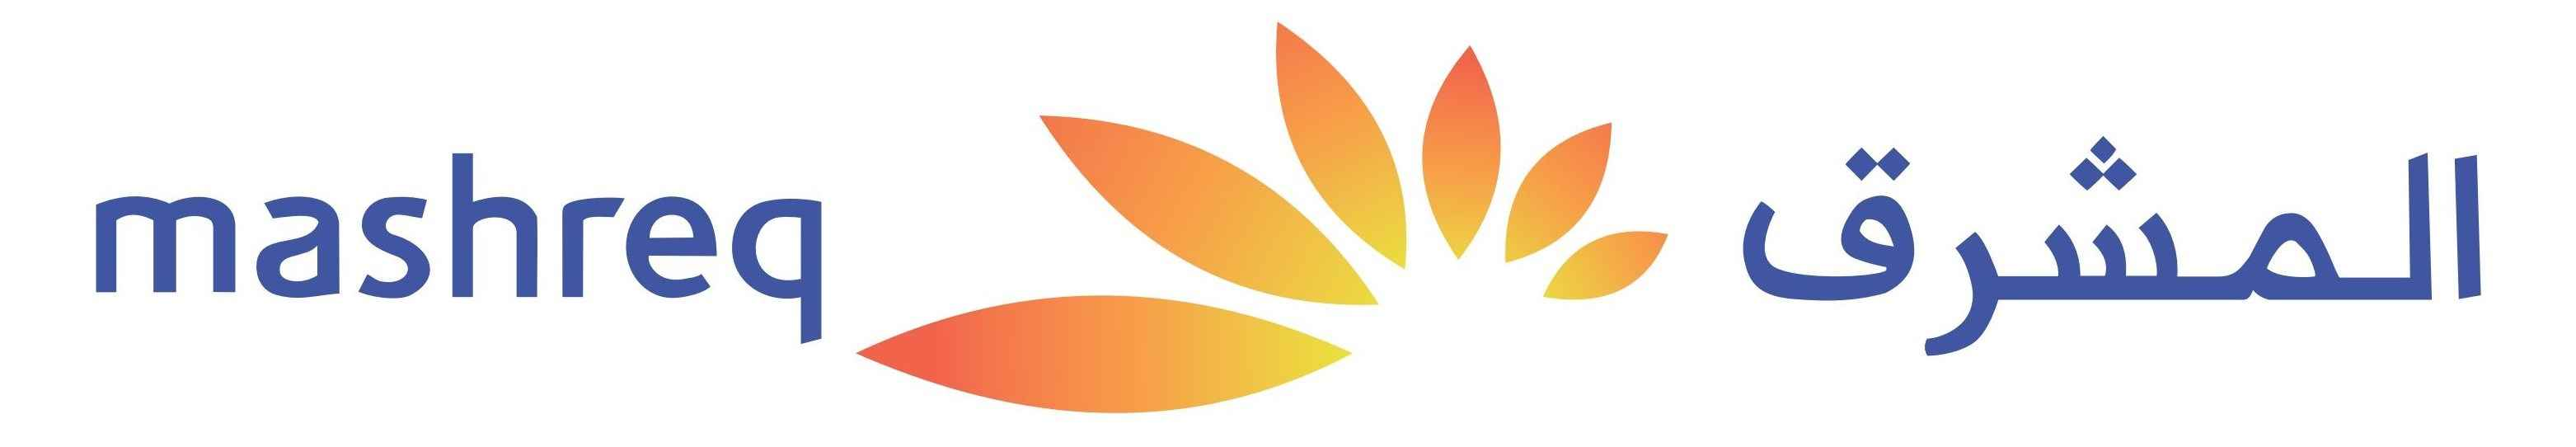 Mashreq bank Logo [EPS File]